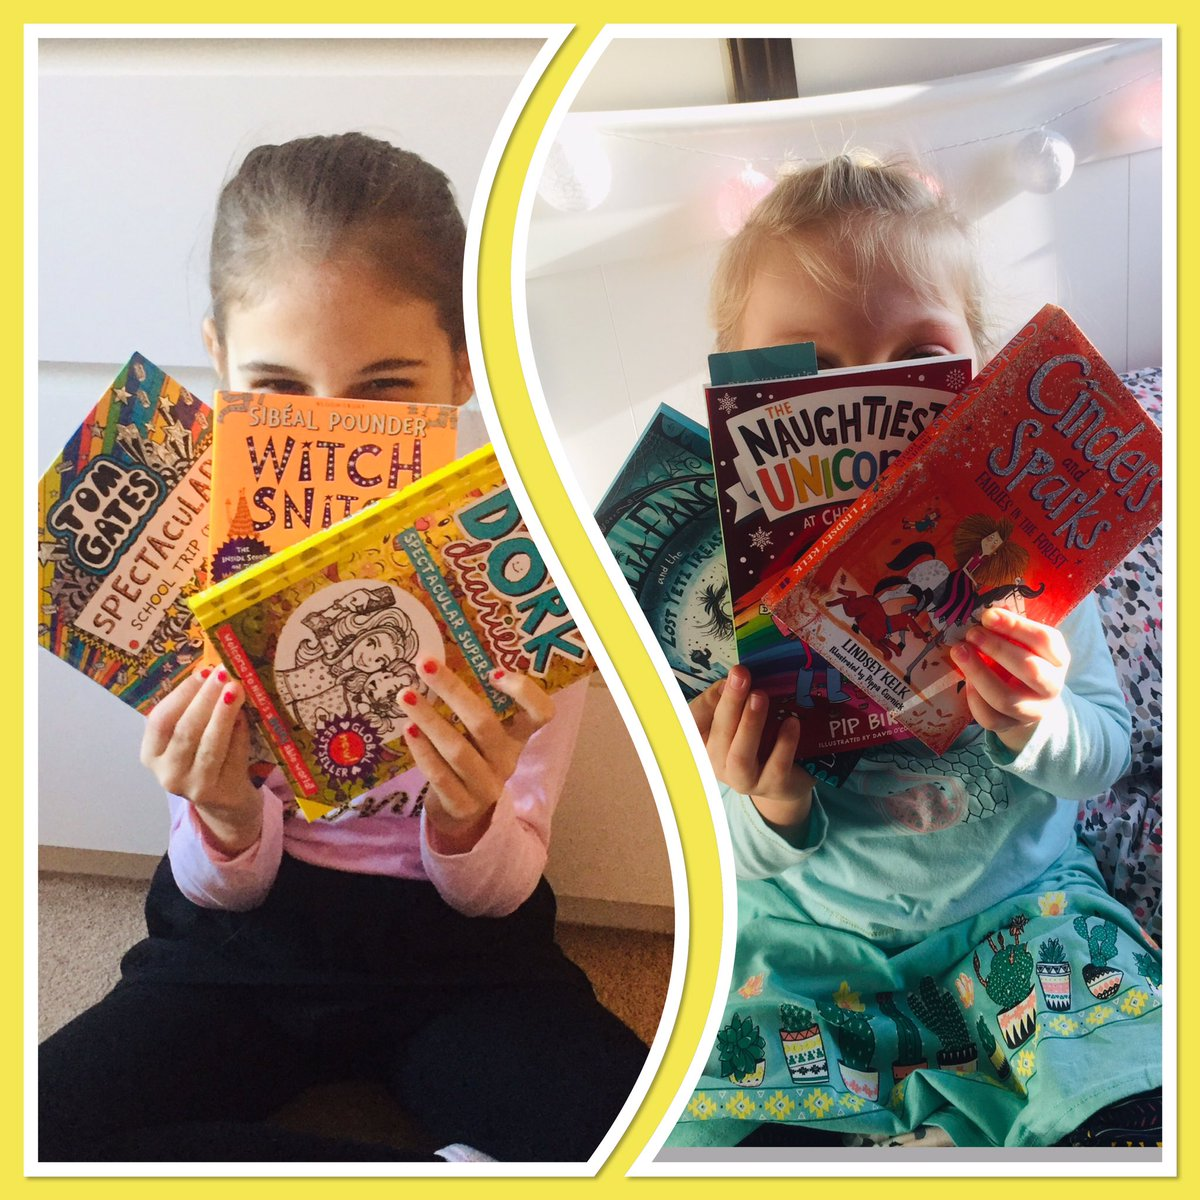 New year, new books to read! Very excited children #amreading #loveofbooks @LindseyKelk @Lillustrator @Sibealpounder @LizPichon @DorkDiaries <br>http://pic.twitter.com/YkKM8uoKIY